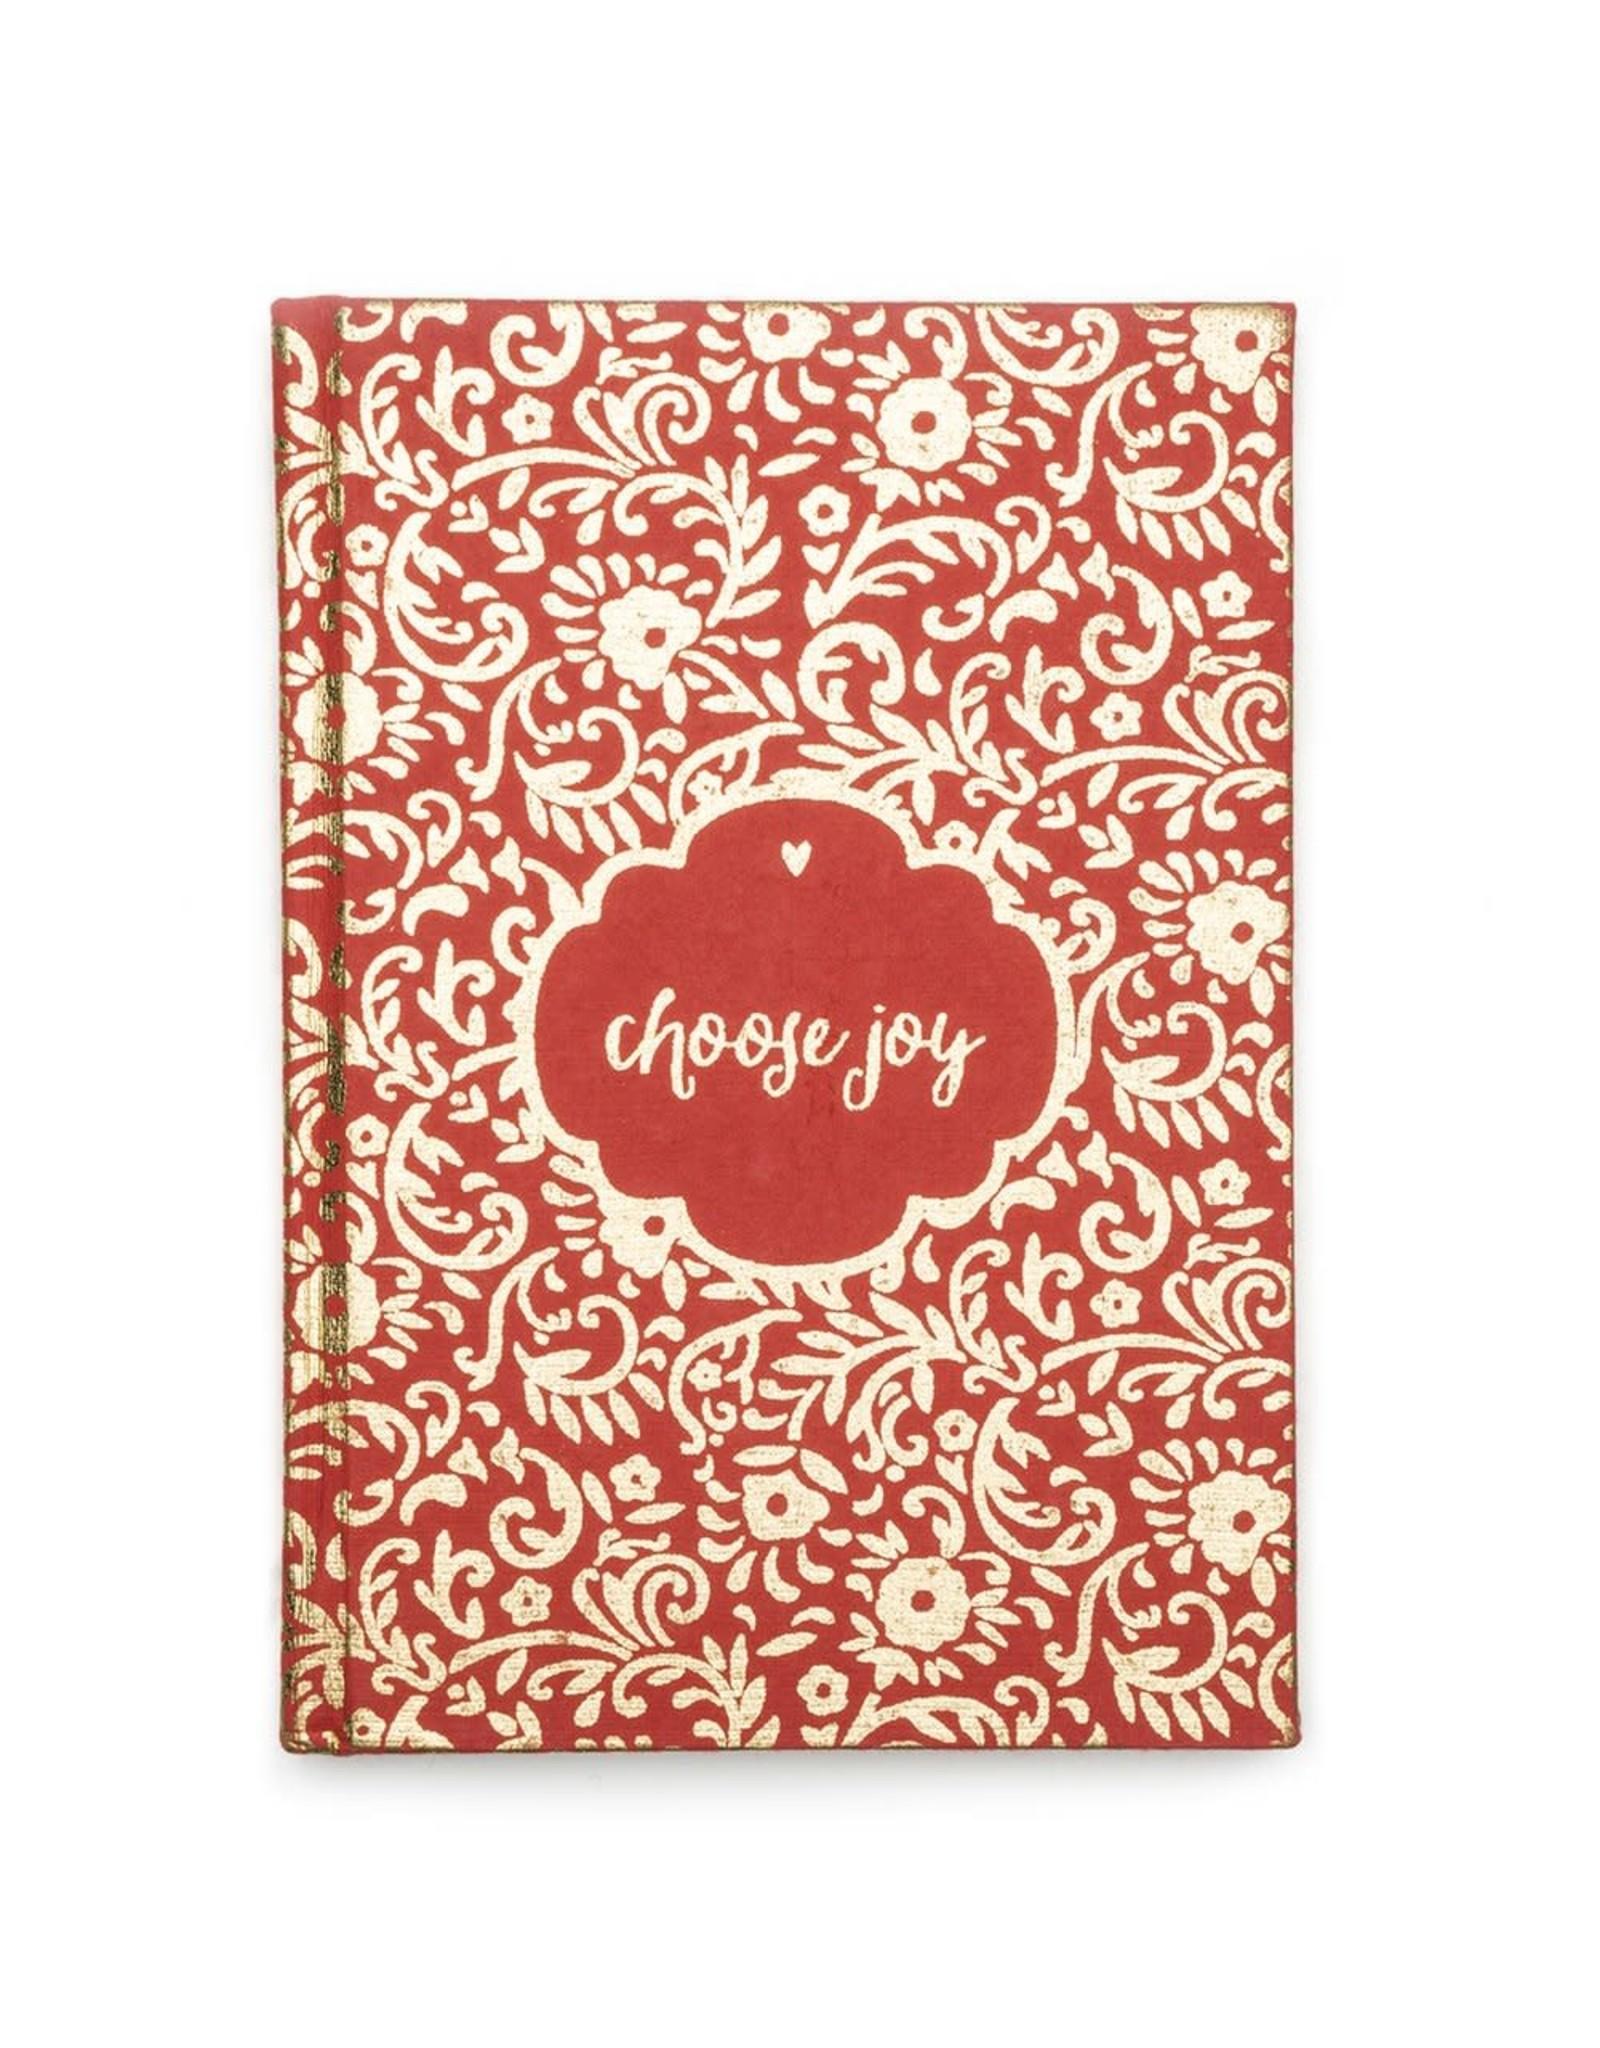 Matr Boomie Choose Joy Journal, India